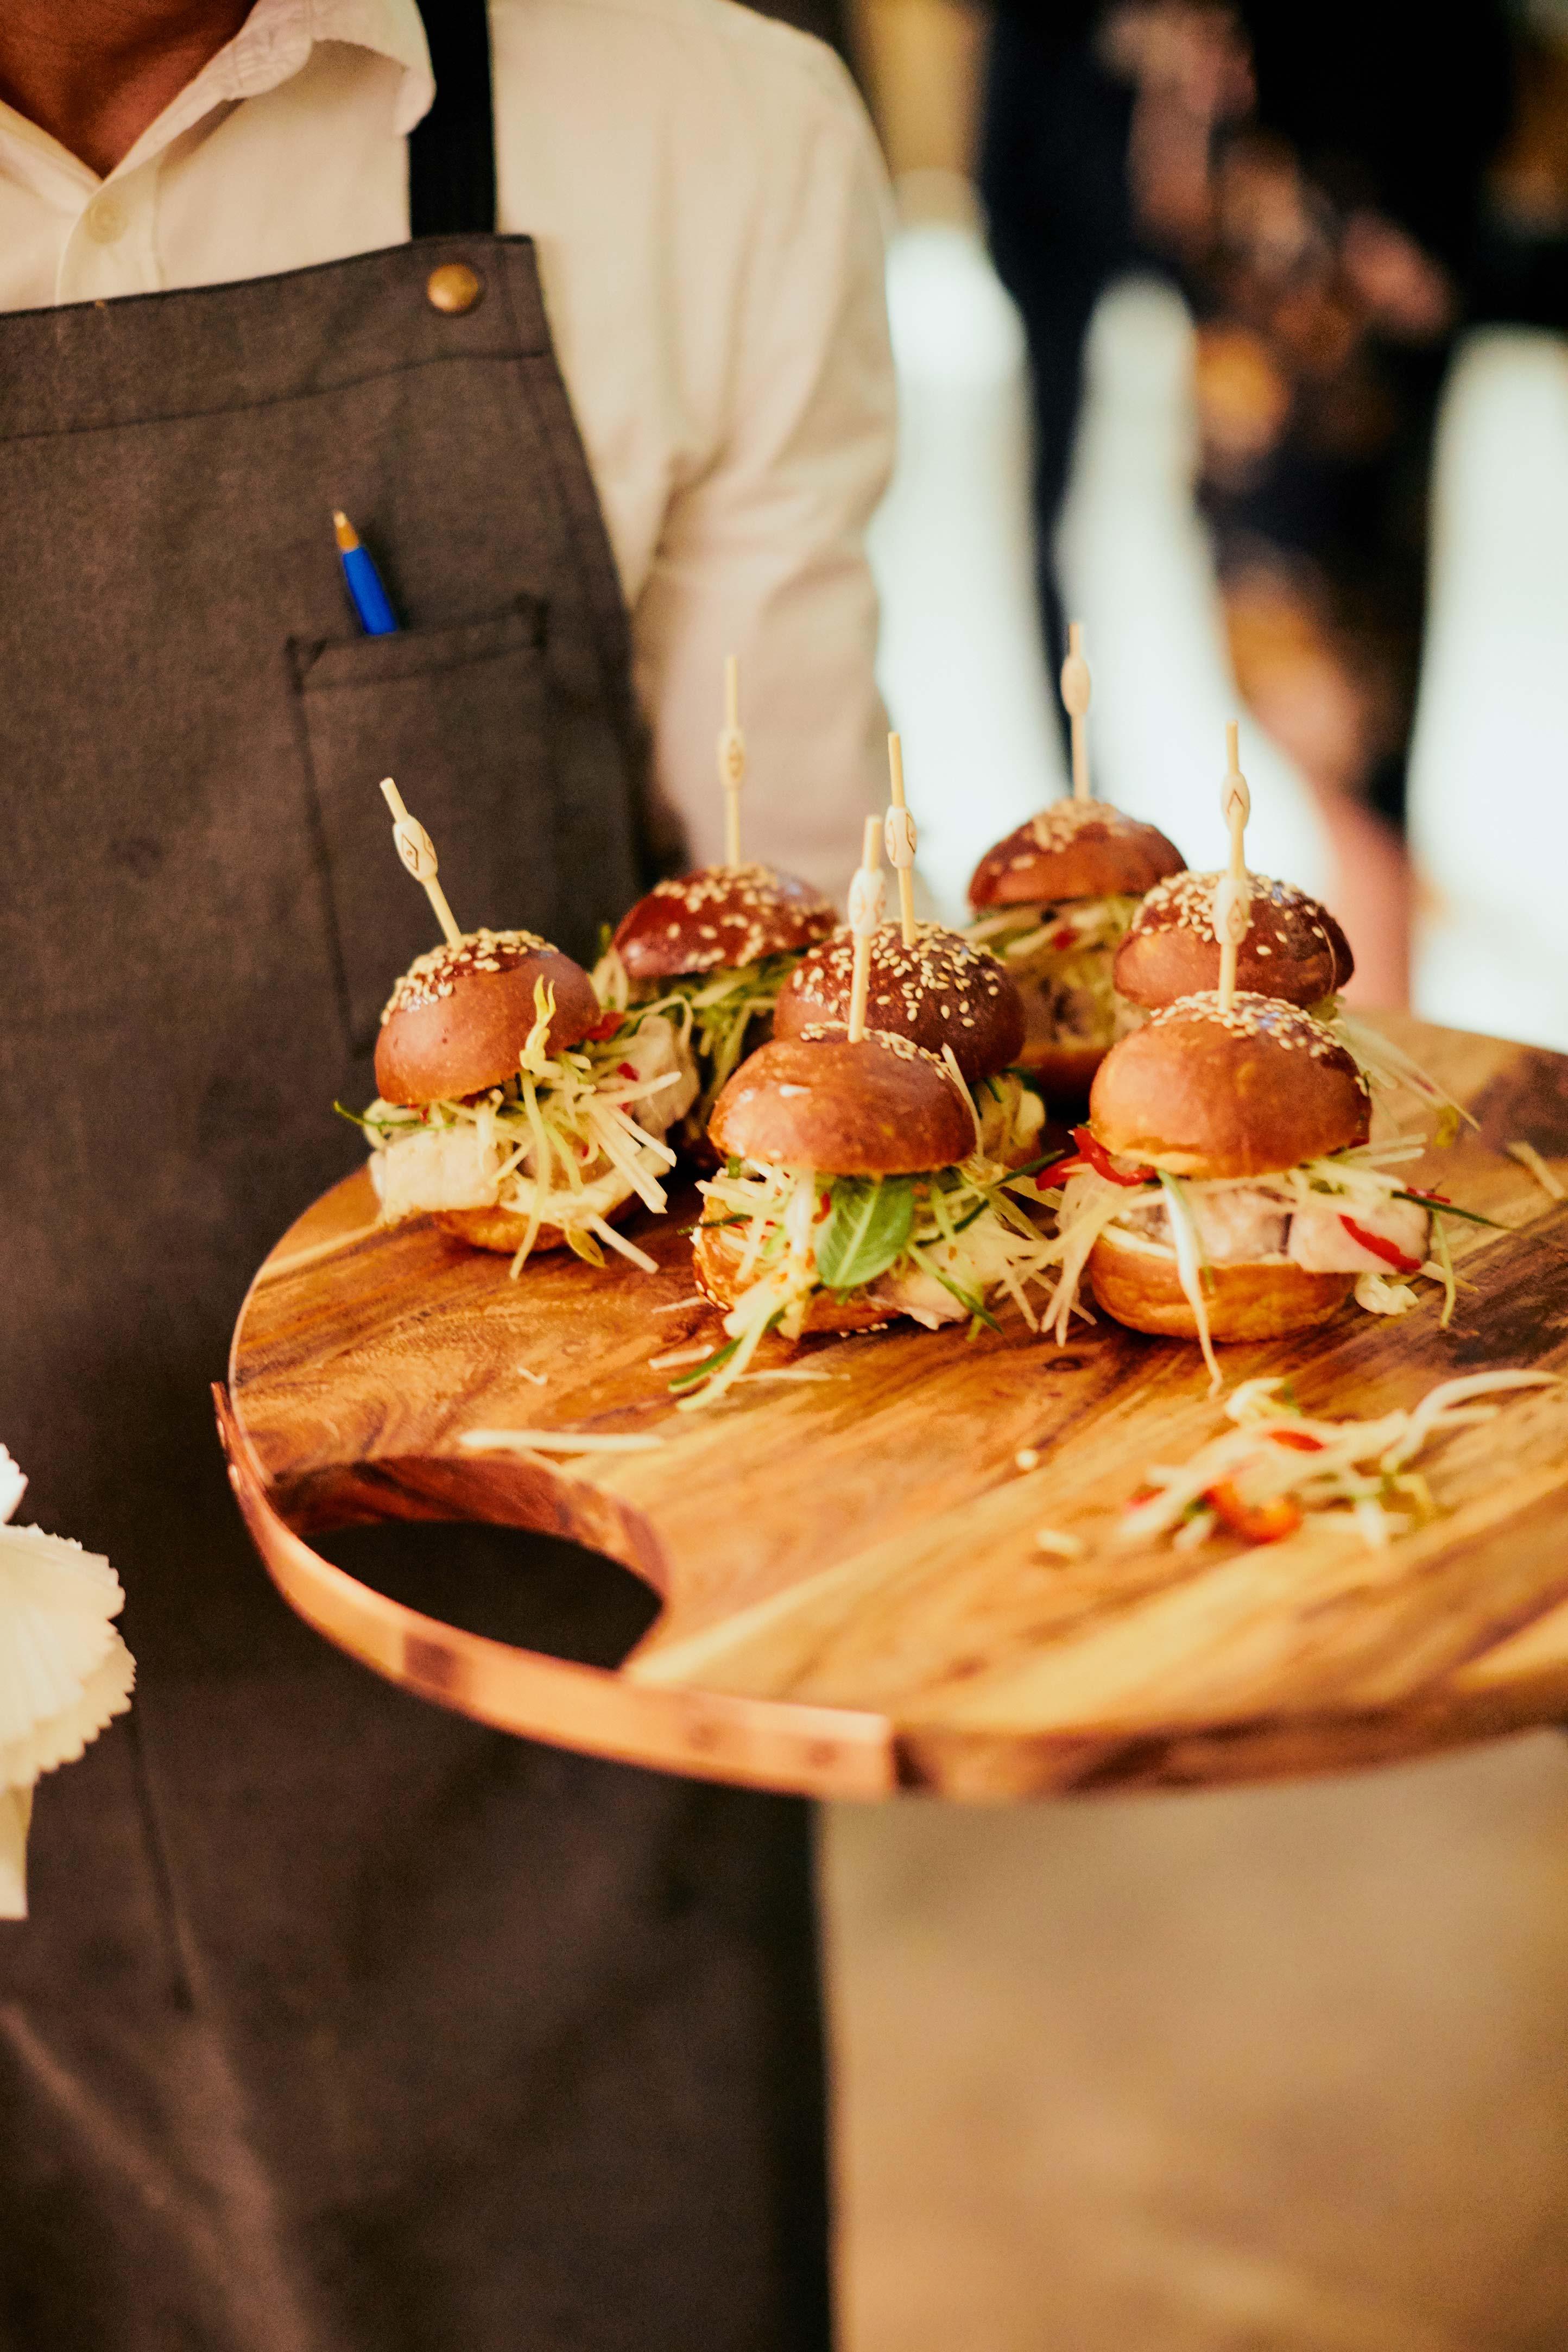 Melbourne-Wedding-Photographer-Kettle-Black-reception-food